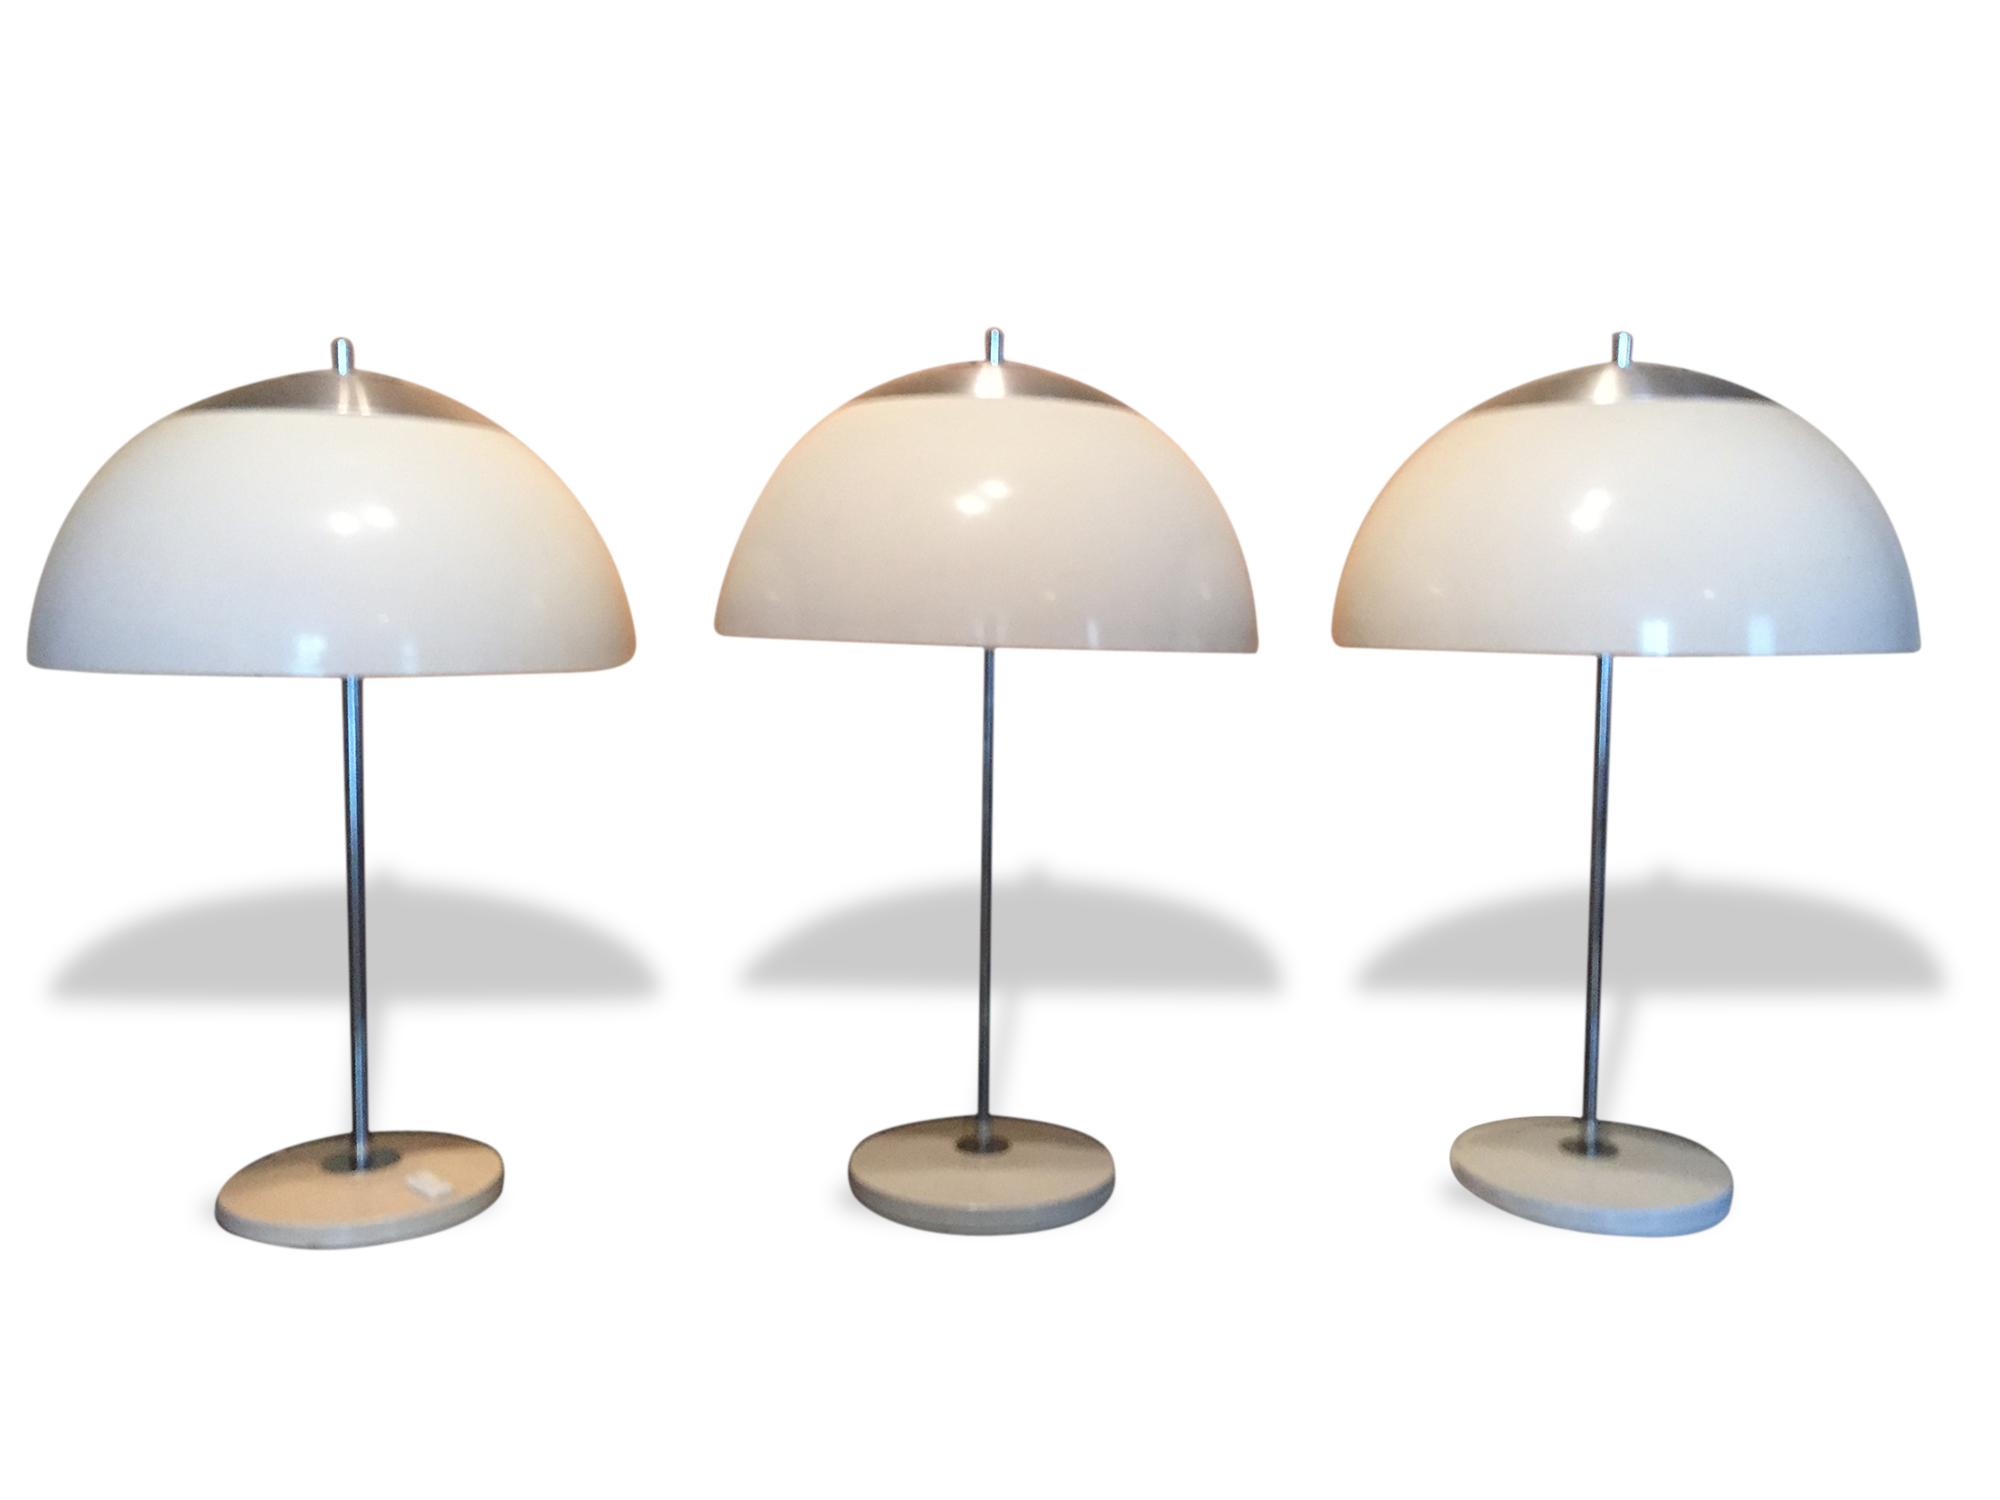 Lampe Champignon Vintage Unilux - Plastique - Blanc - Design - 17382